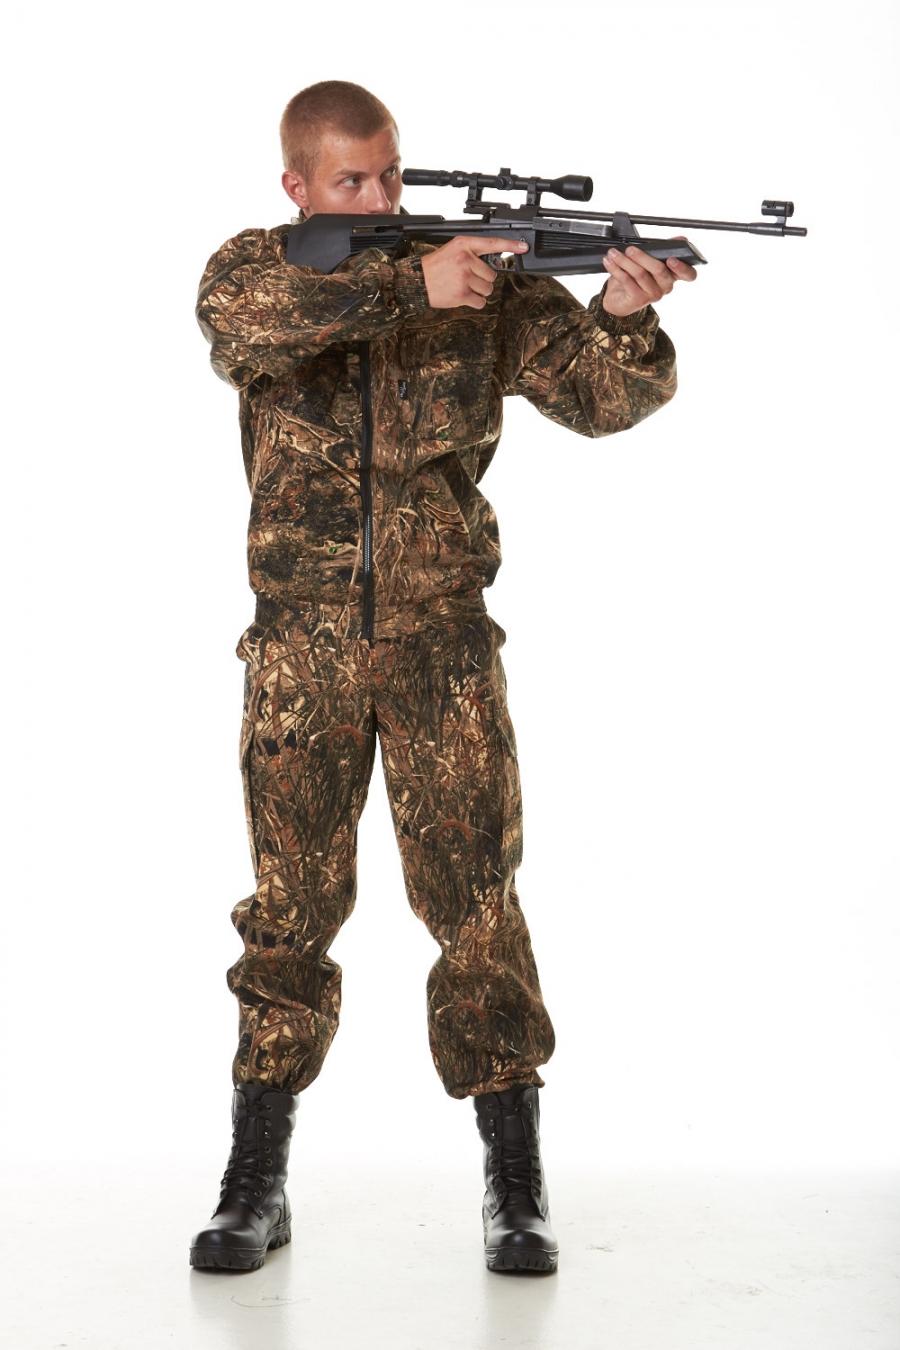 Костюм для охоты и рыбалки Лес-1Одежда для охоты и рыбалки<br><br><br>Размер: 54